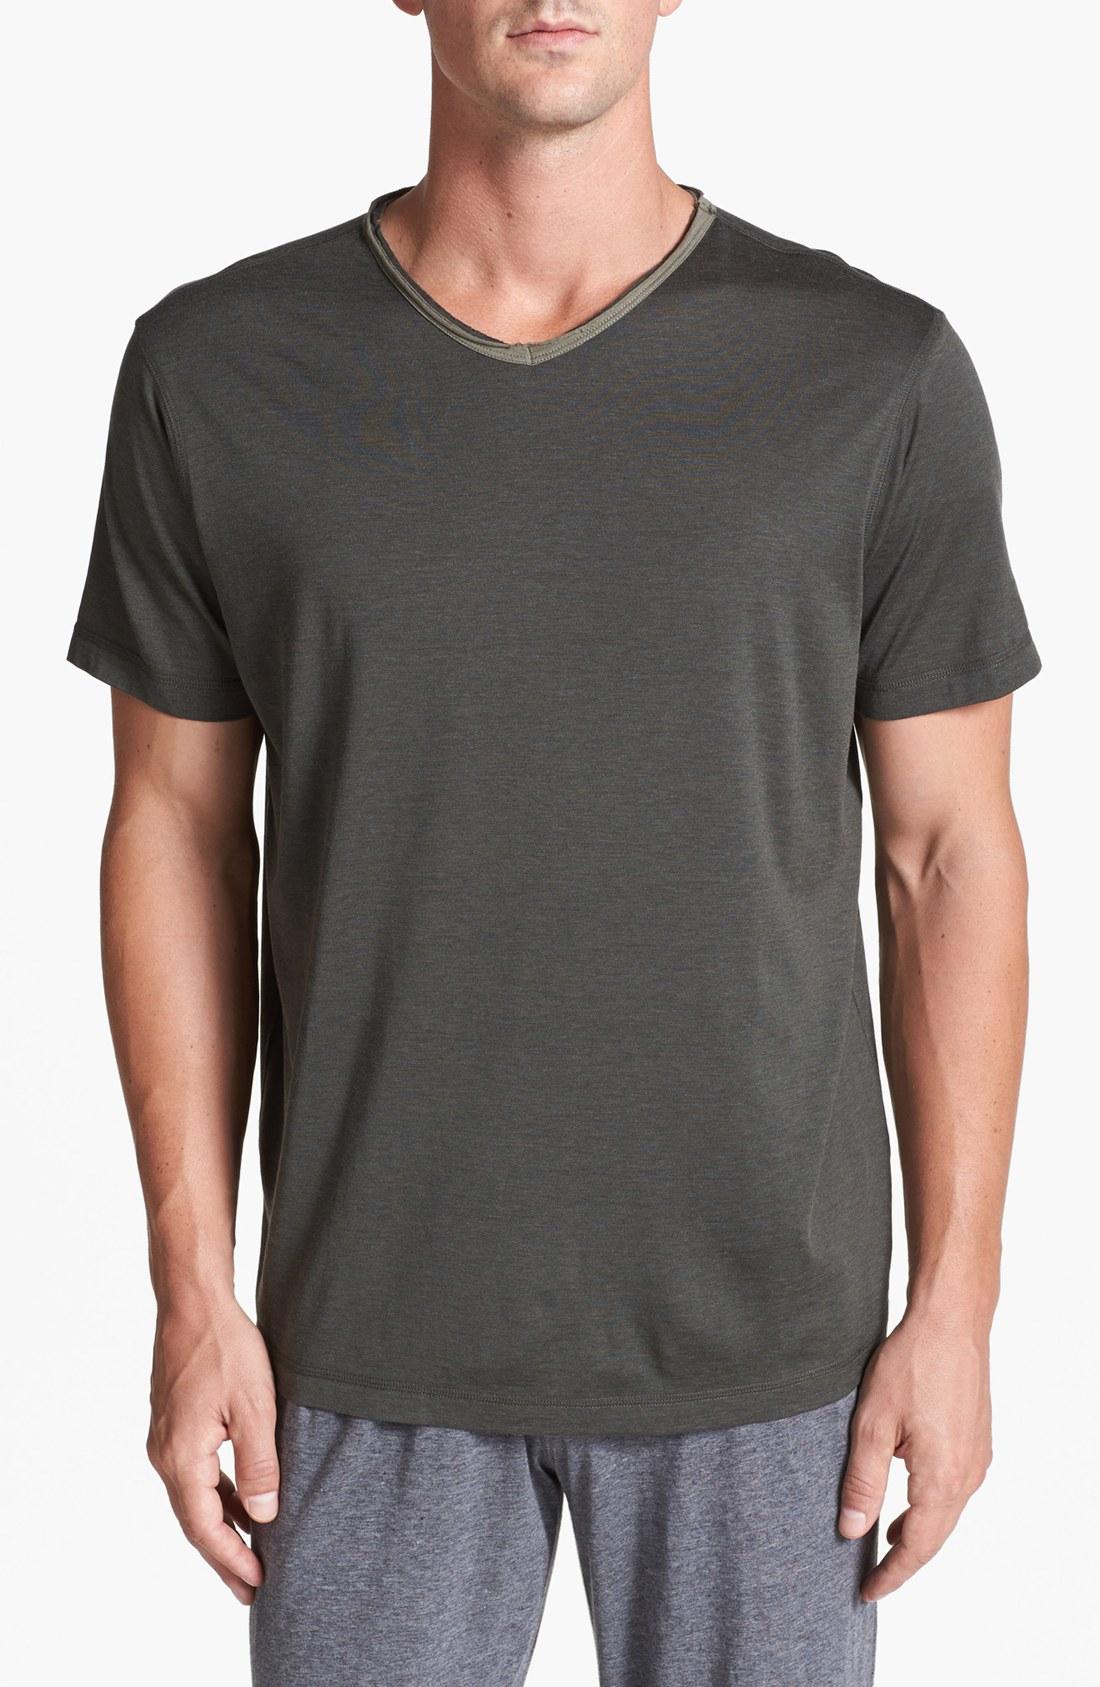 Daniel buchler silk cotton v neck t shirt in gray for men for Cotton silk tee shirts